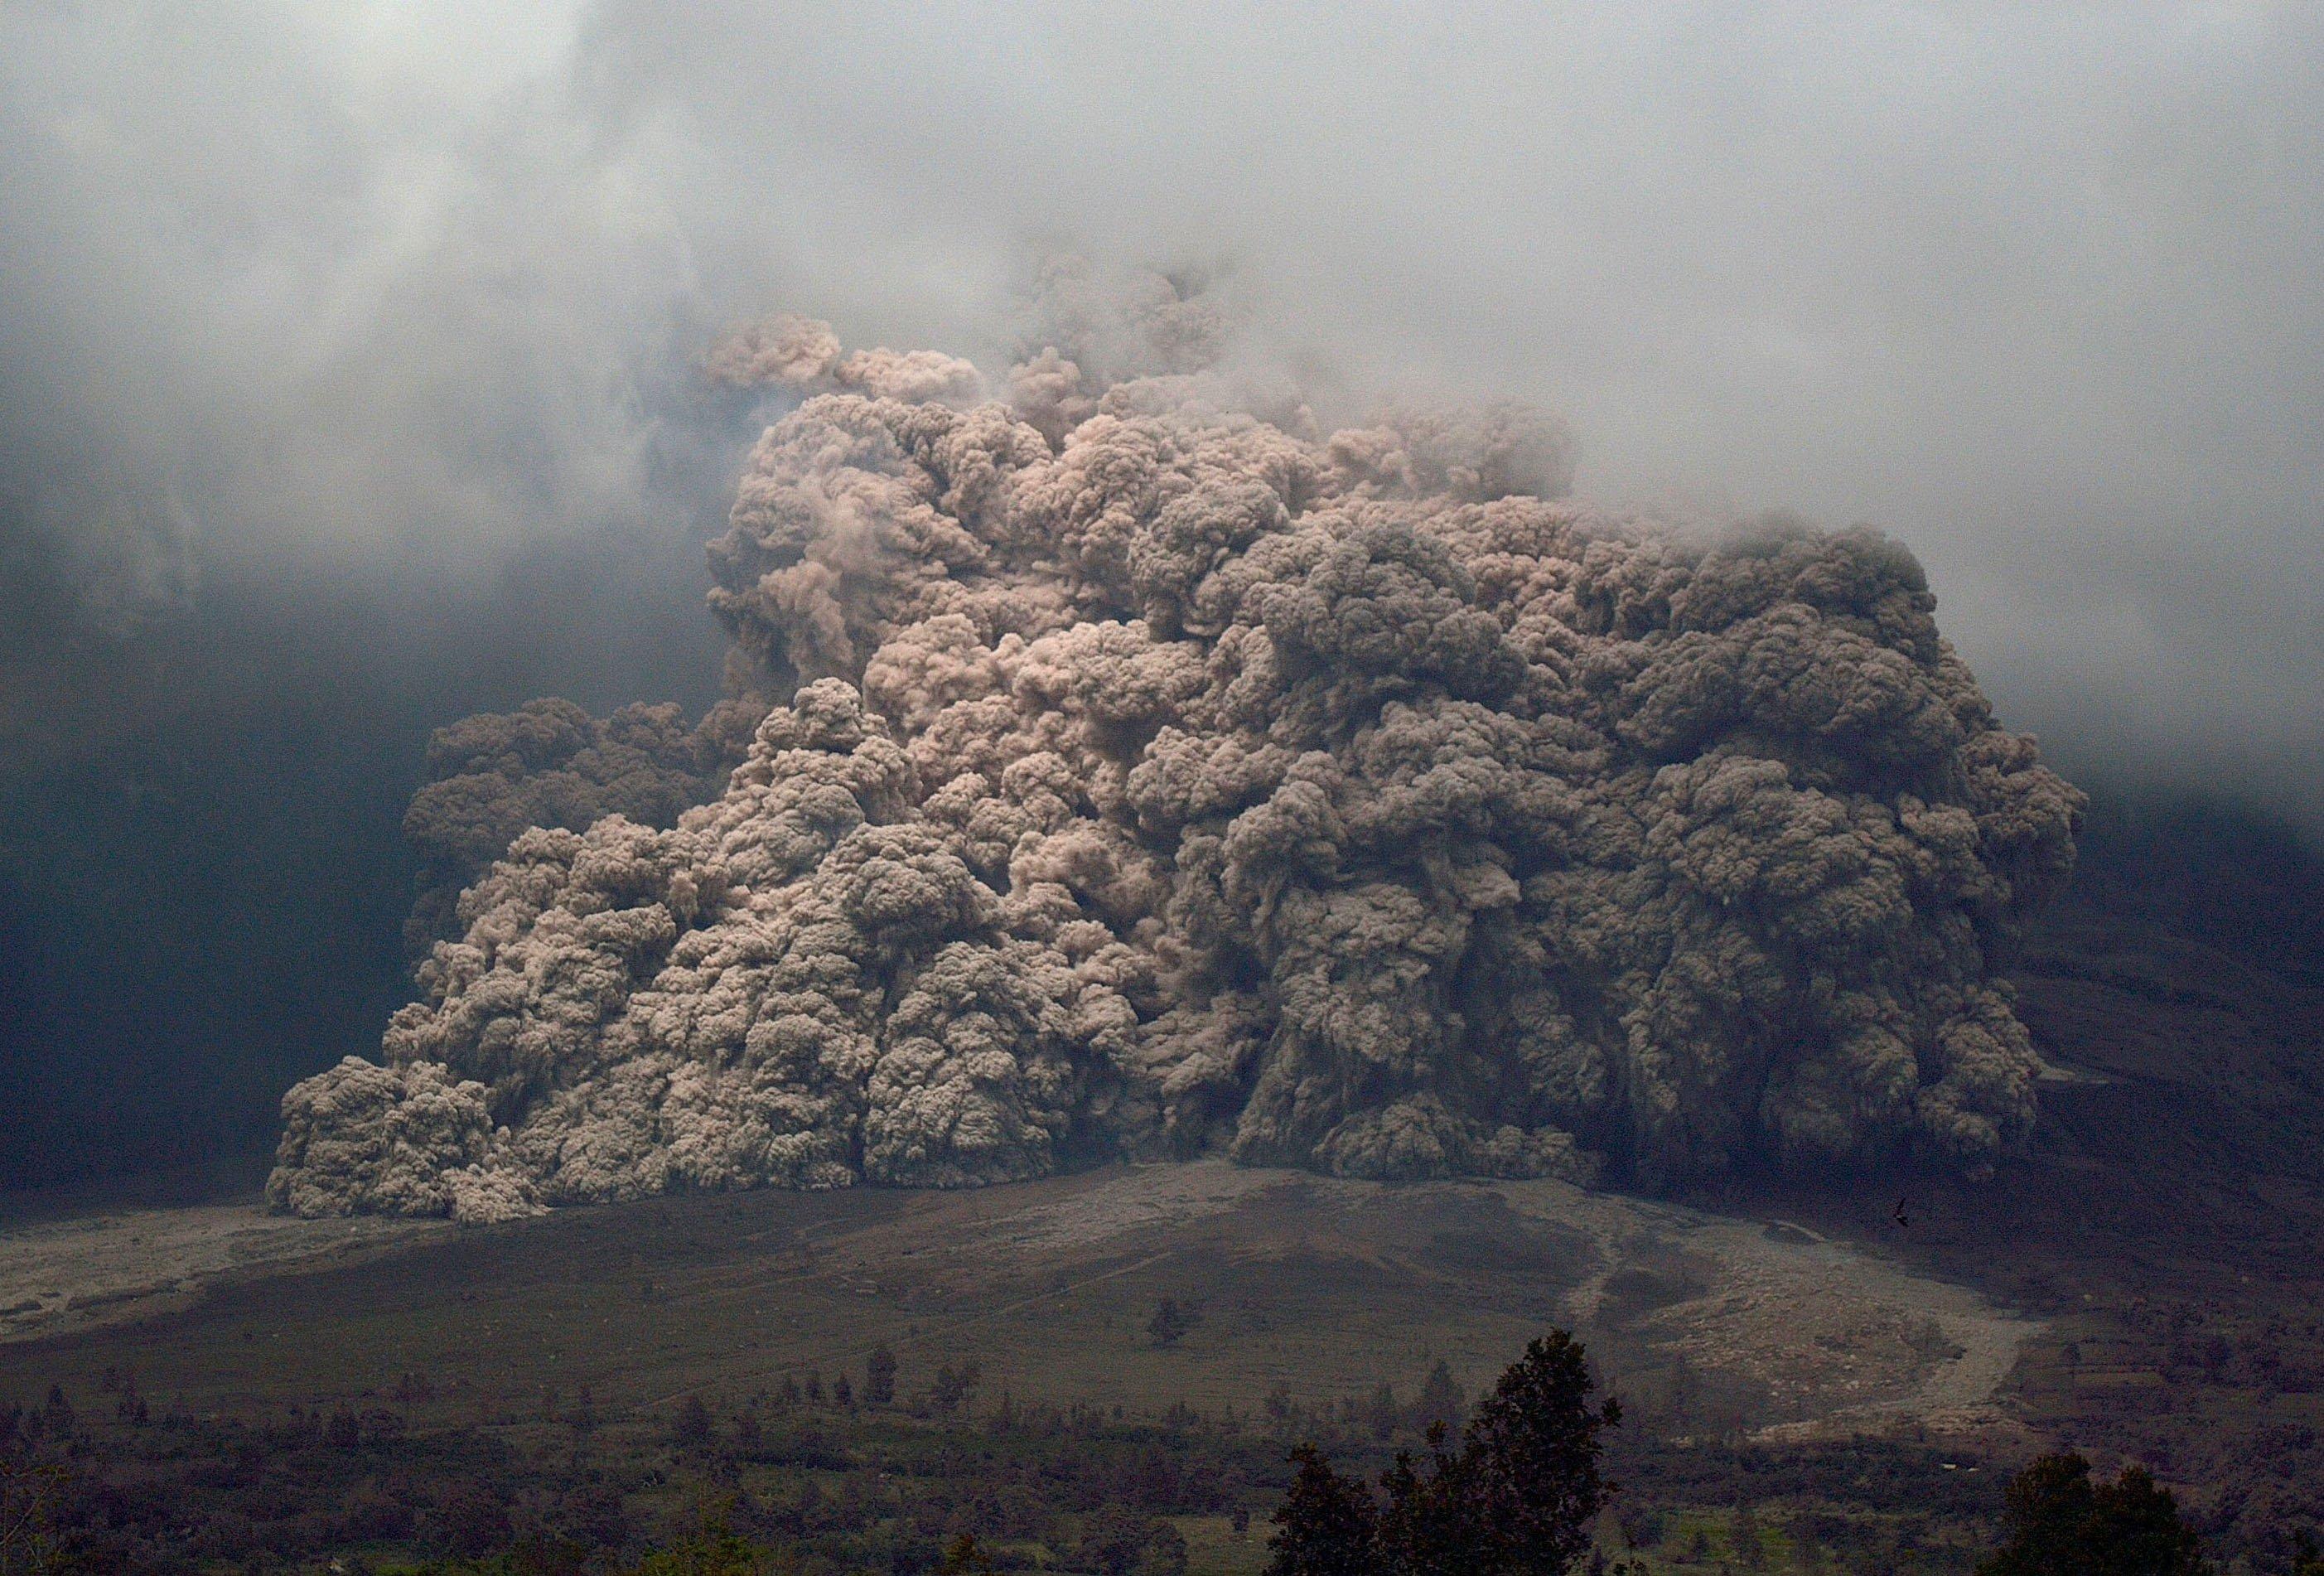 Sinabung mount spews ash to the air during an eruption near Karo, North Sumatra, Indonesia, Jan. 7, 2014.